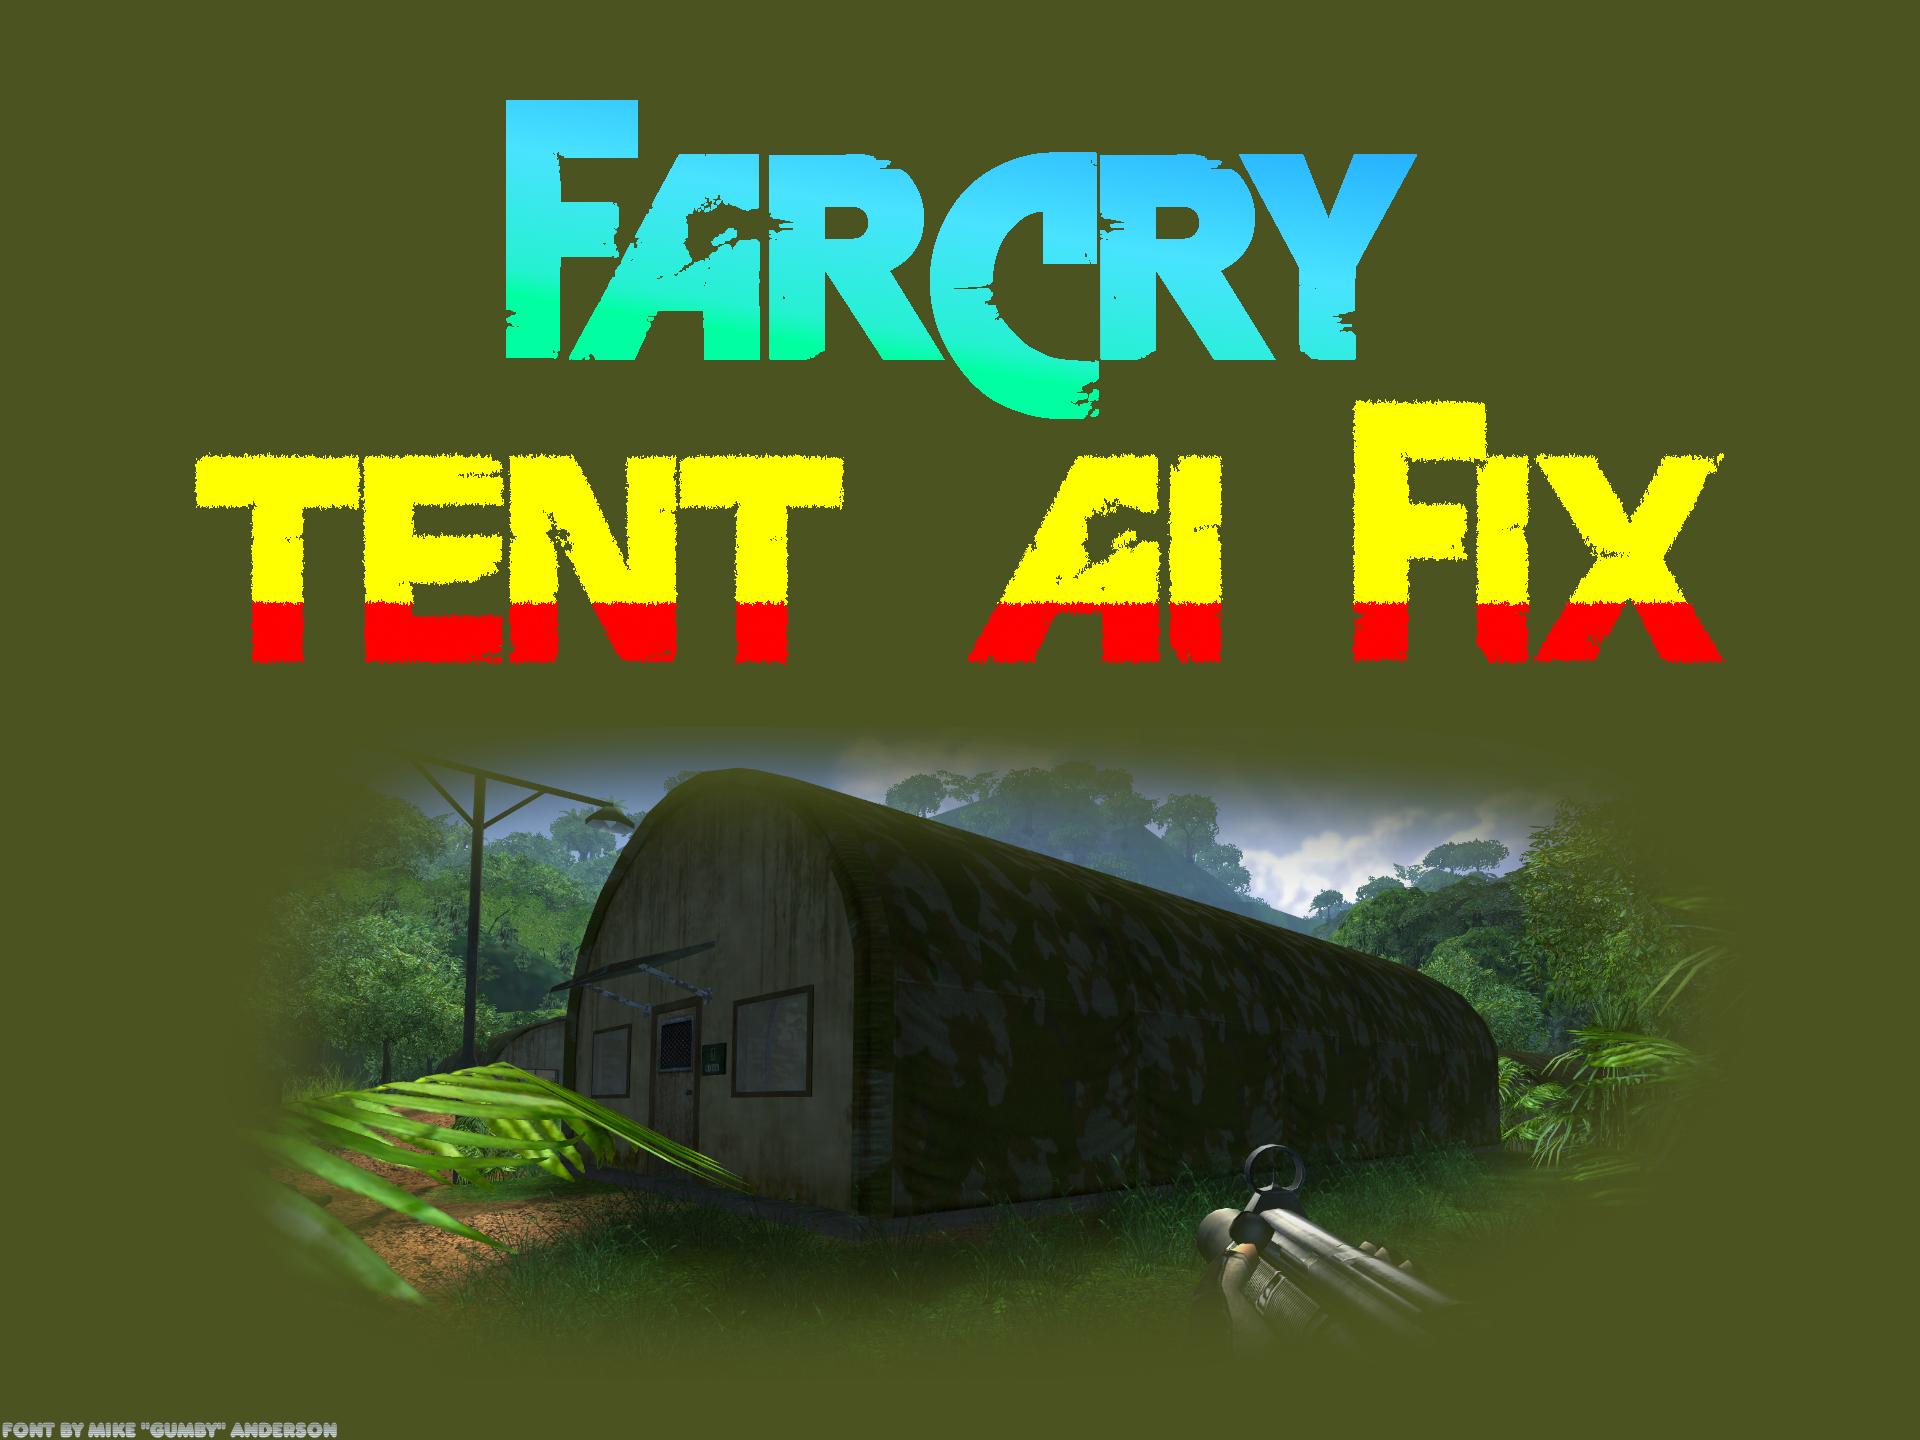 Tent AI Bug Fix mod for Far Cry - Mod DB